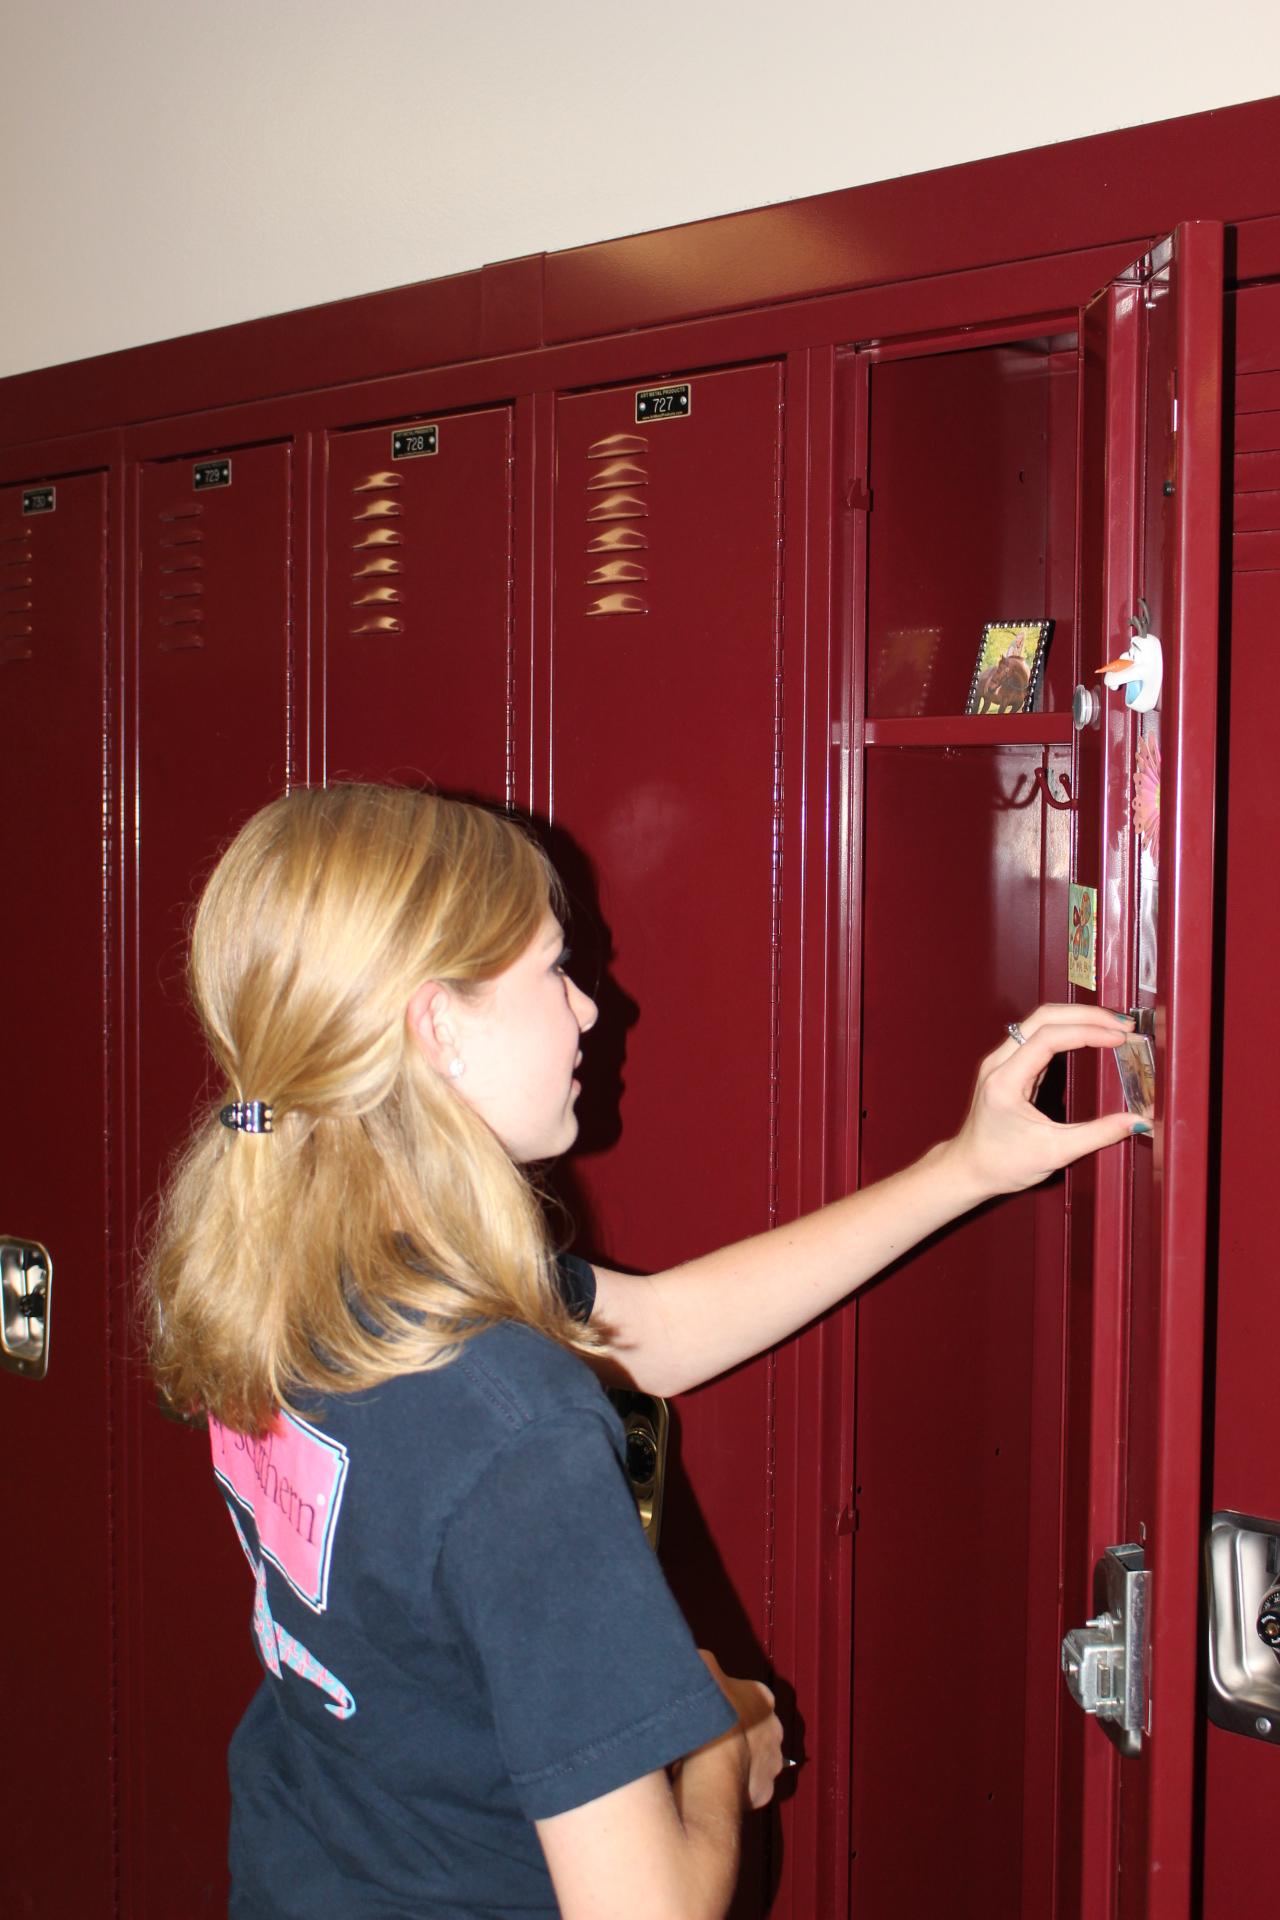 Student opens locker